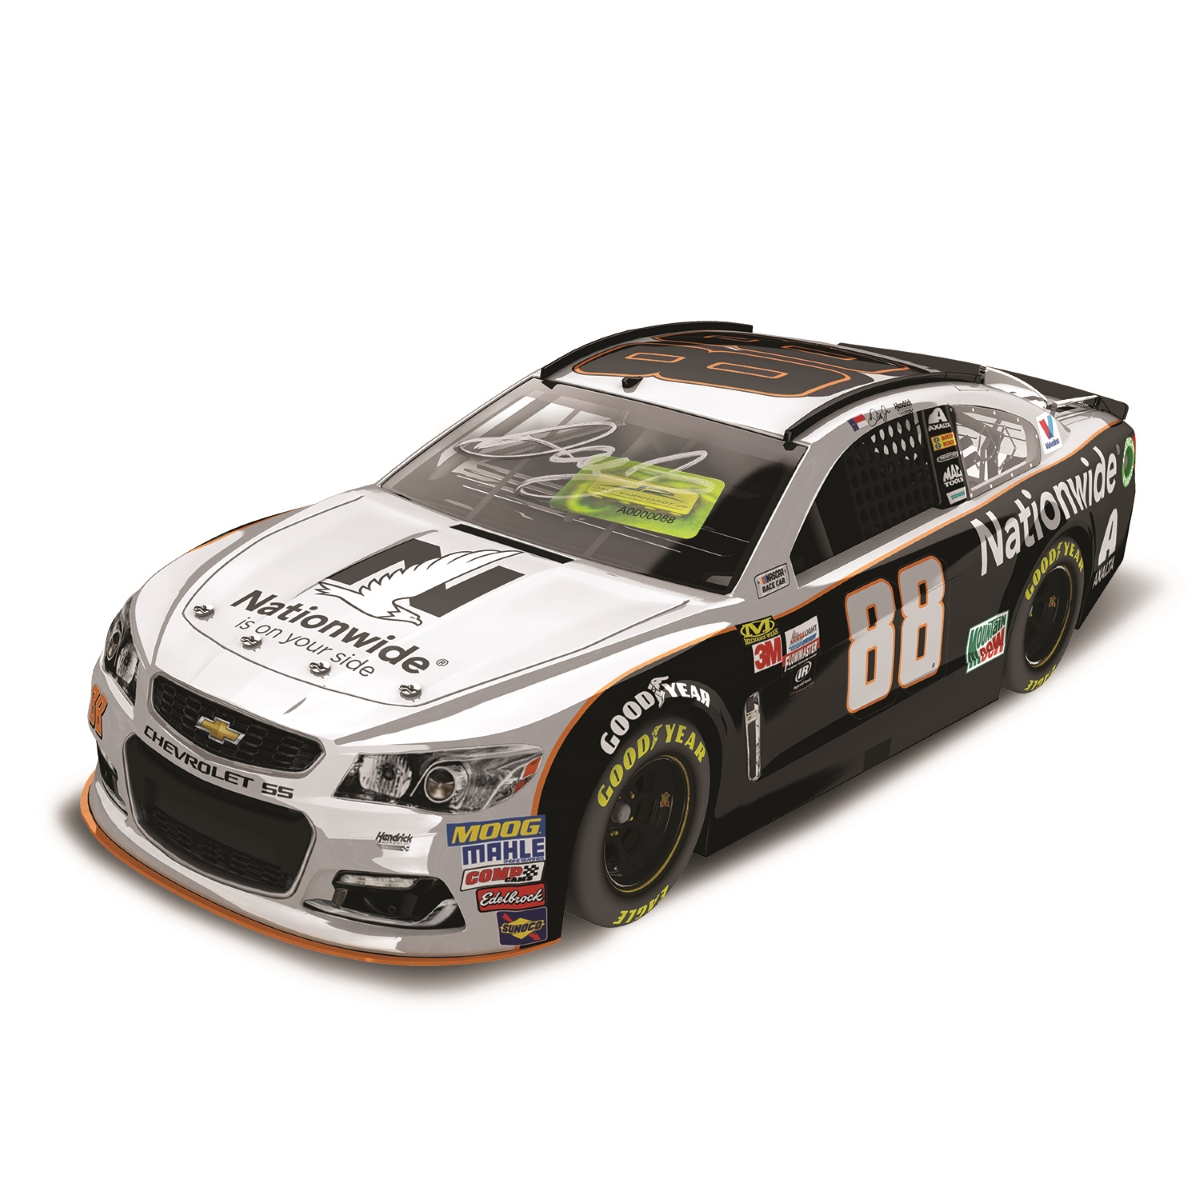 AUTOGRAPHED Dale Earnhardt, Jr. 2017 NASCAR Cup Series No. 88 Nationwide Grey Ghost 1:24 Die-Cast